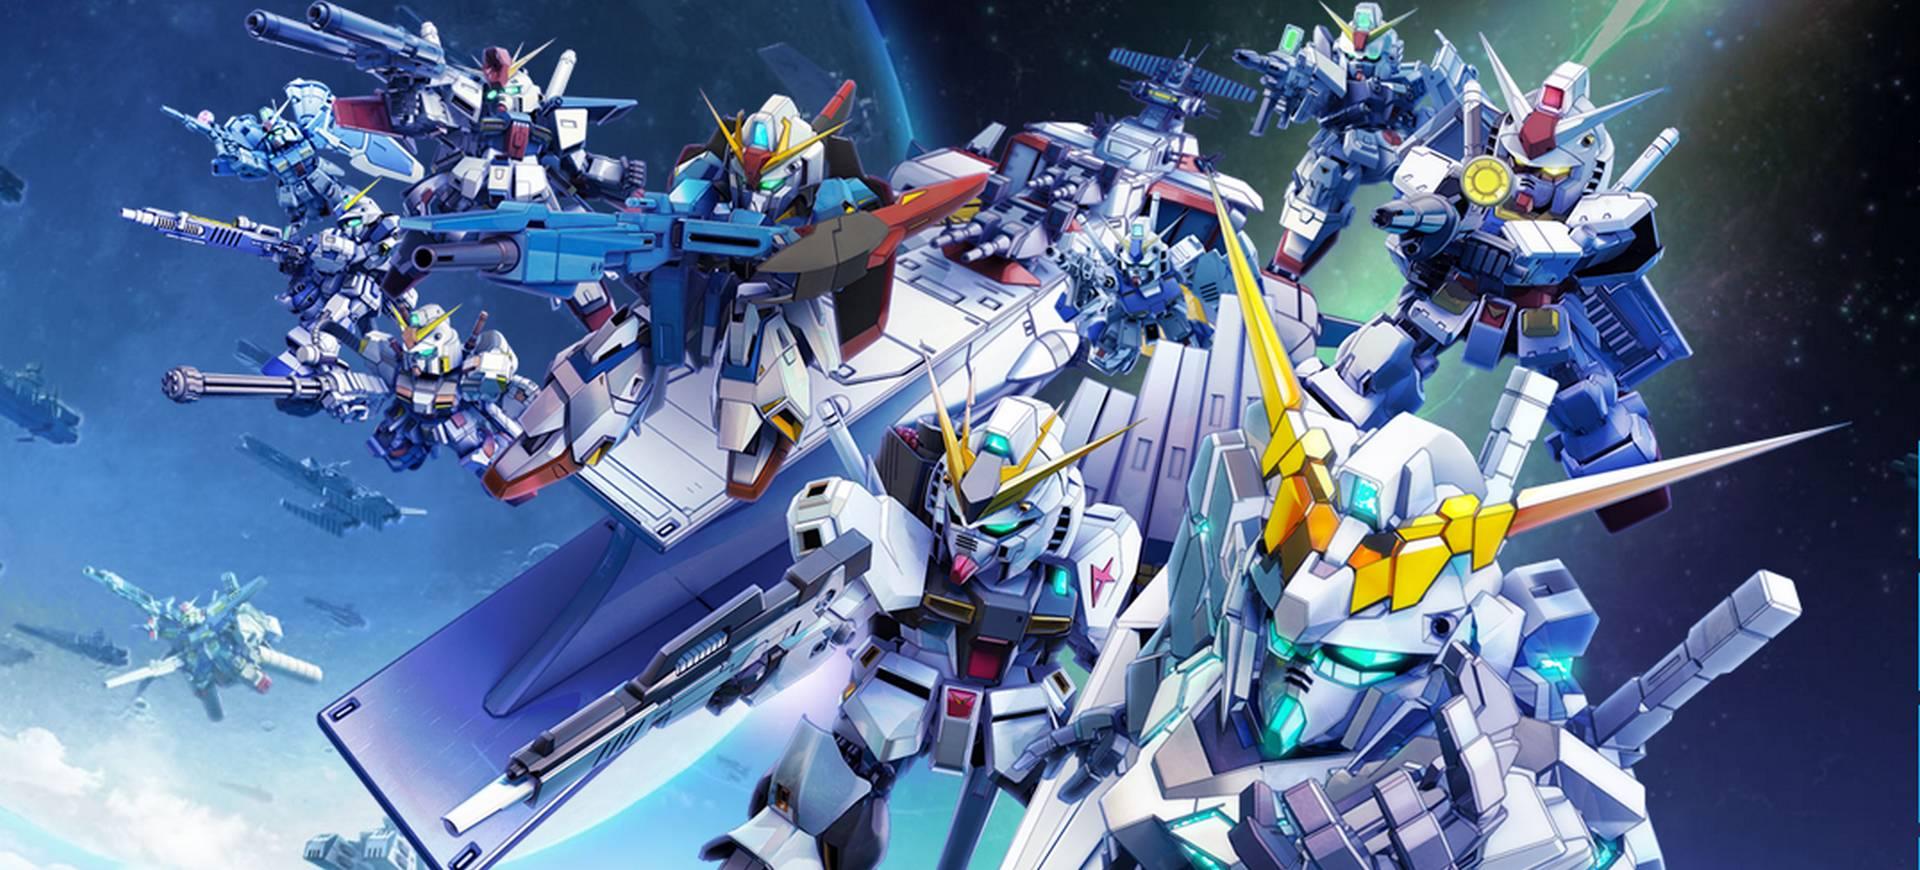 SD Gundam G Generation Genesis - Đánh Giá Game